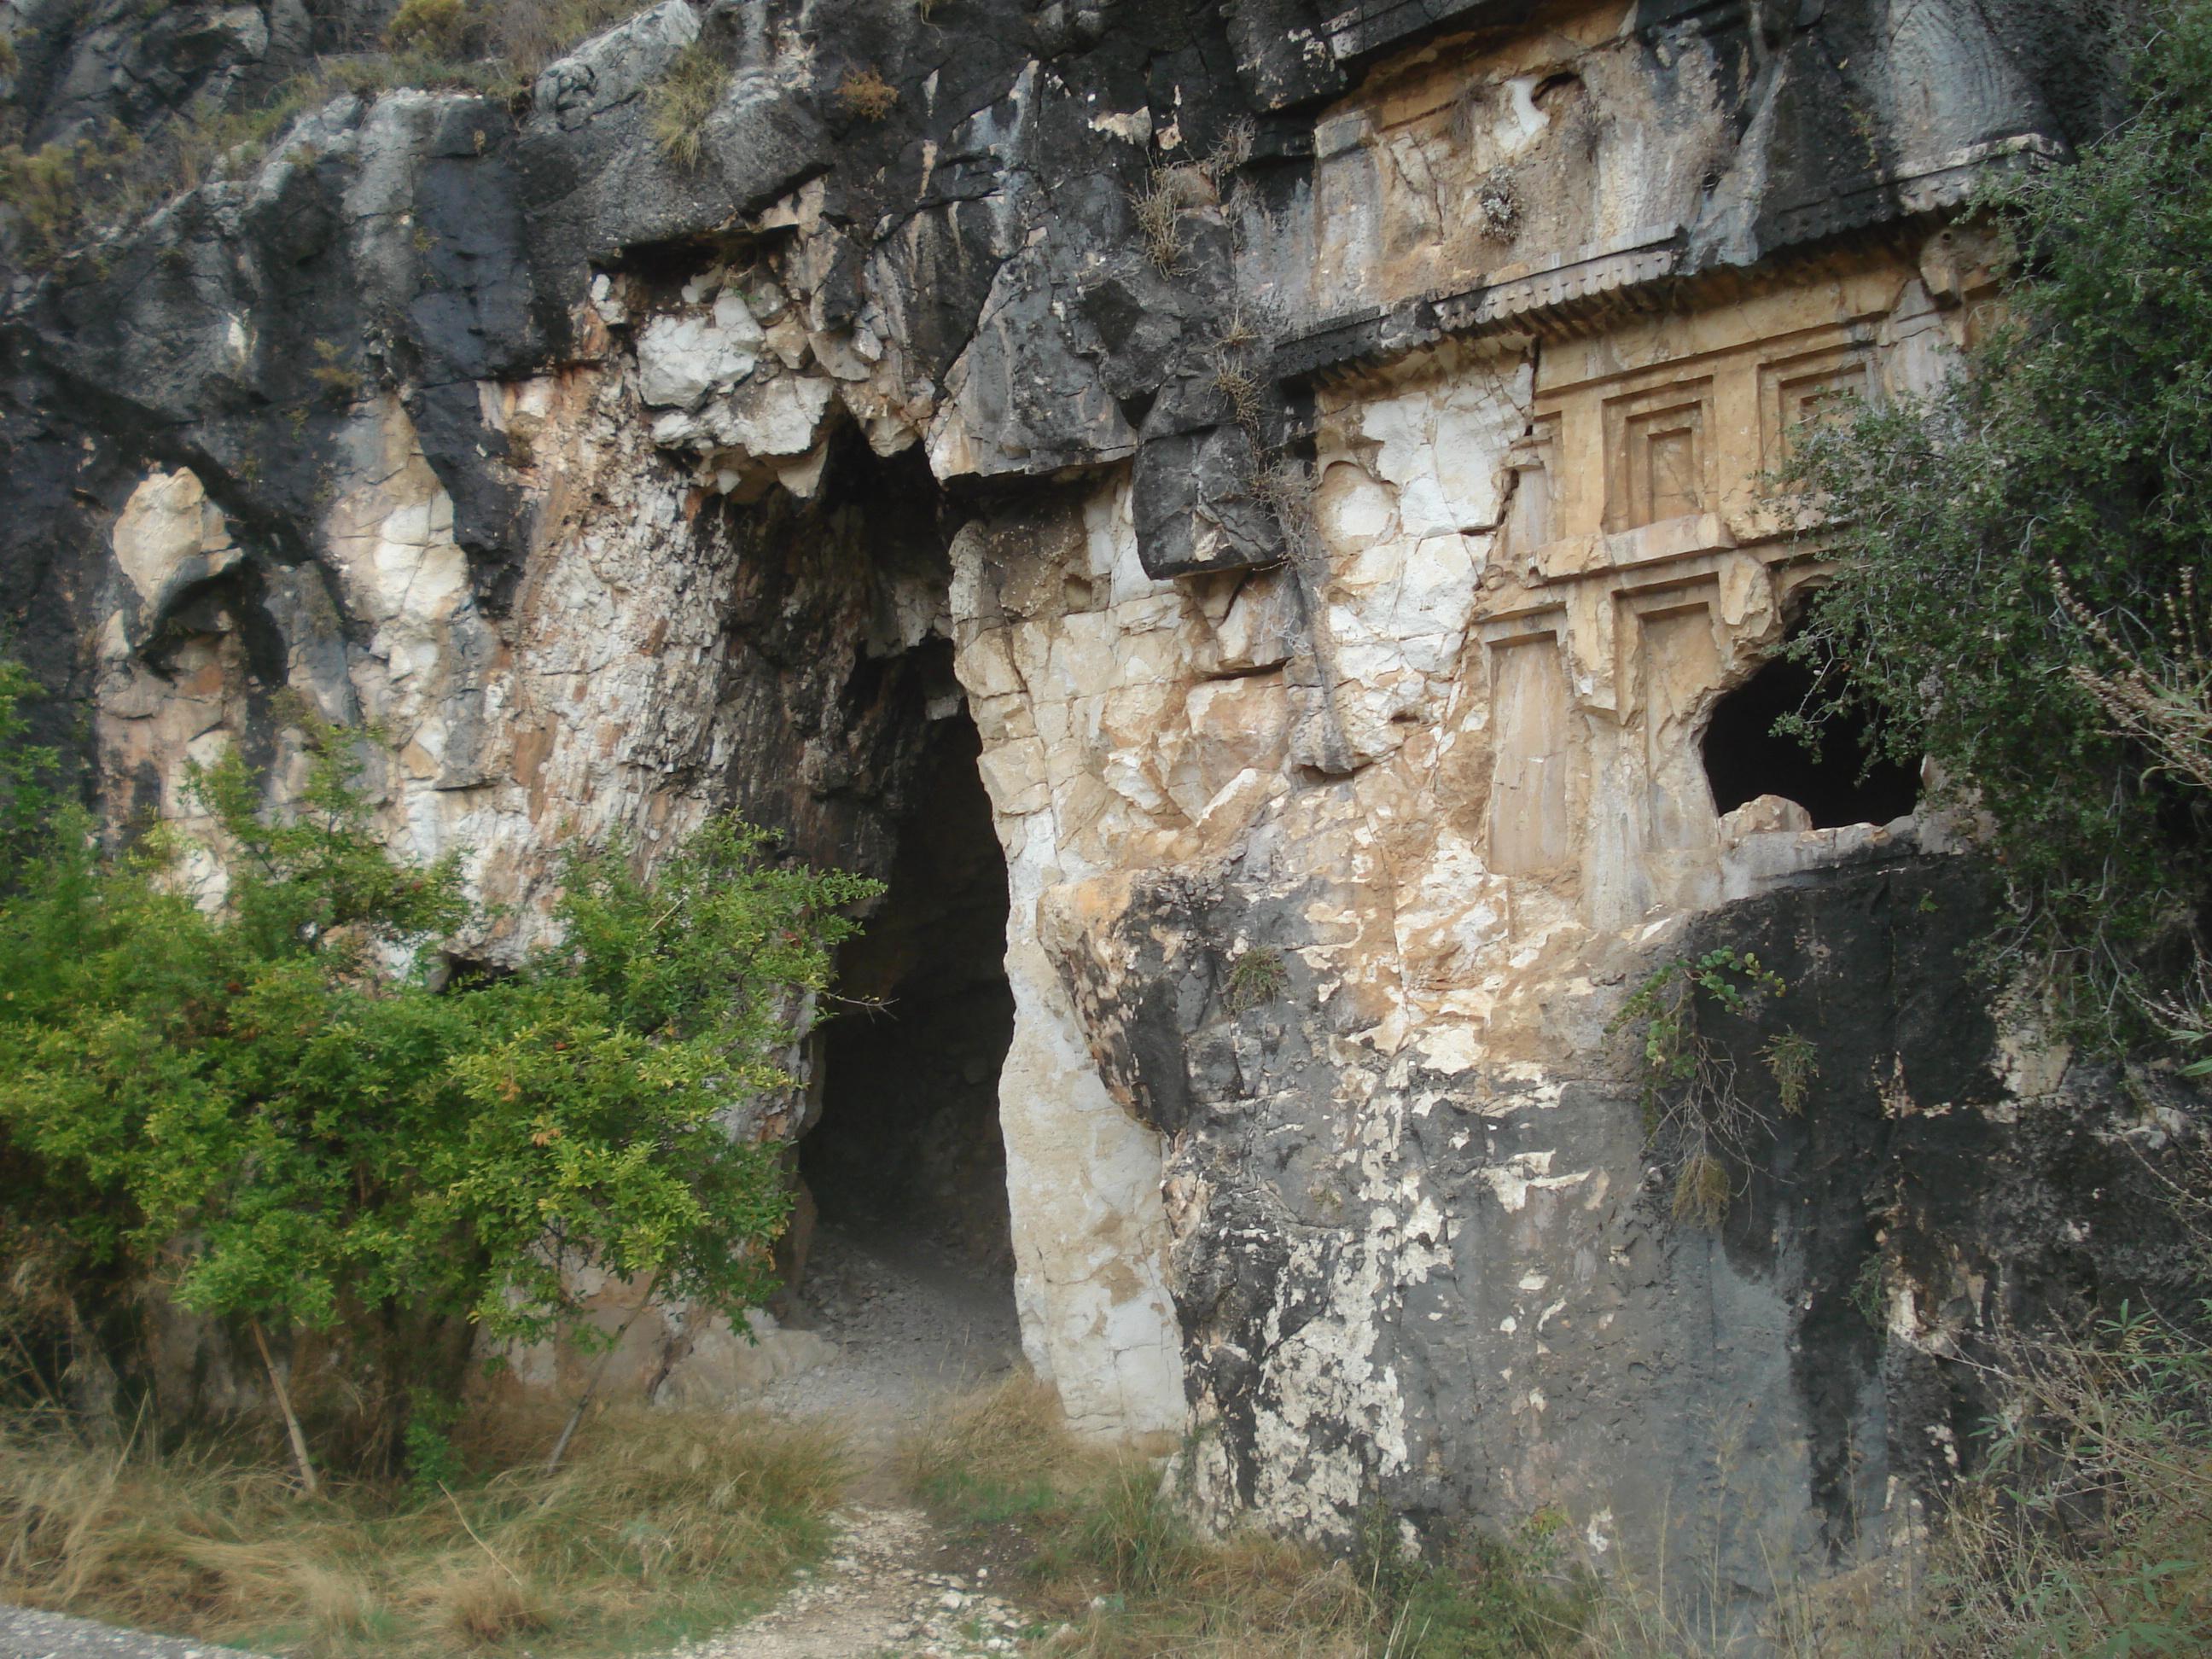 Description Myra tumba rupestre de cerca.JPG